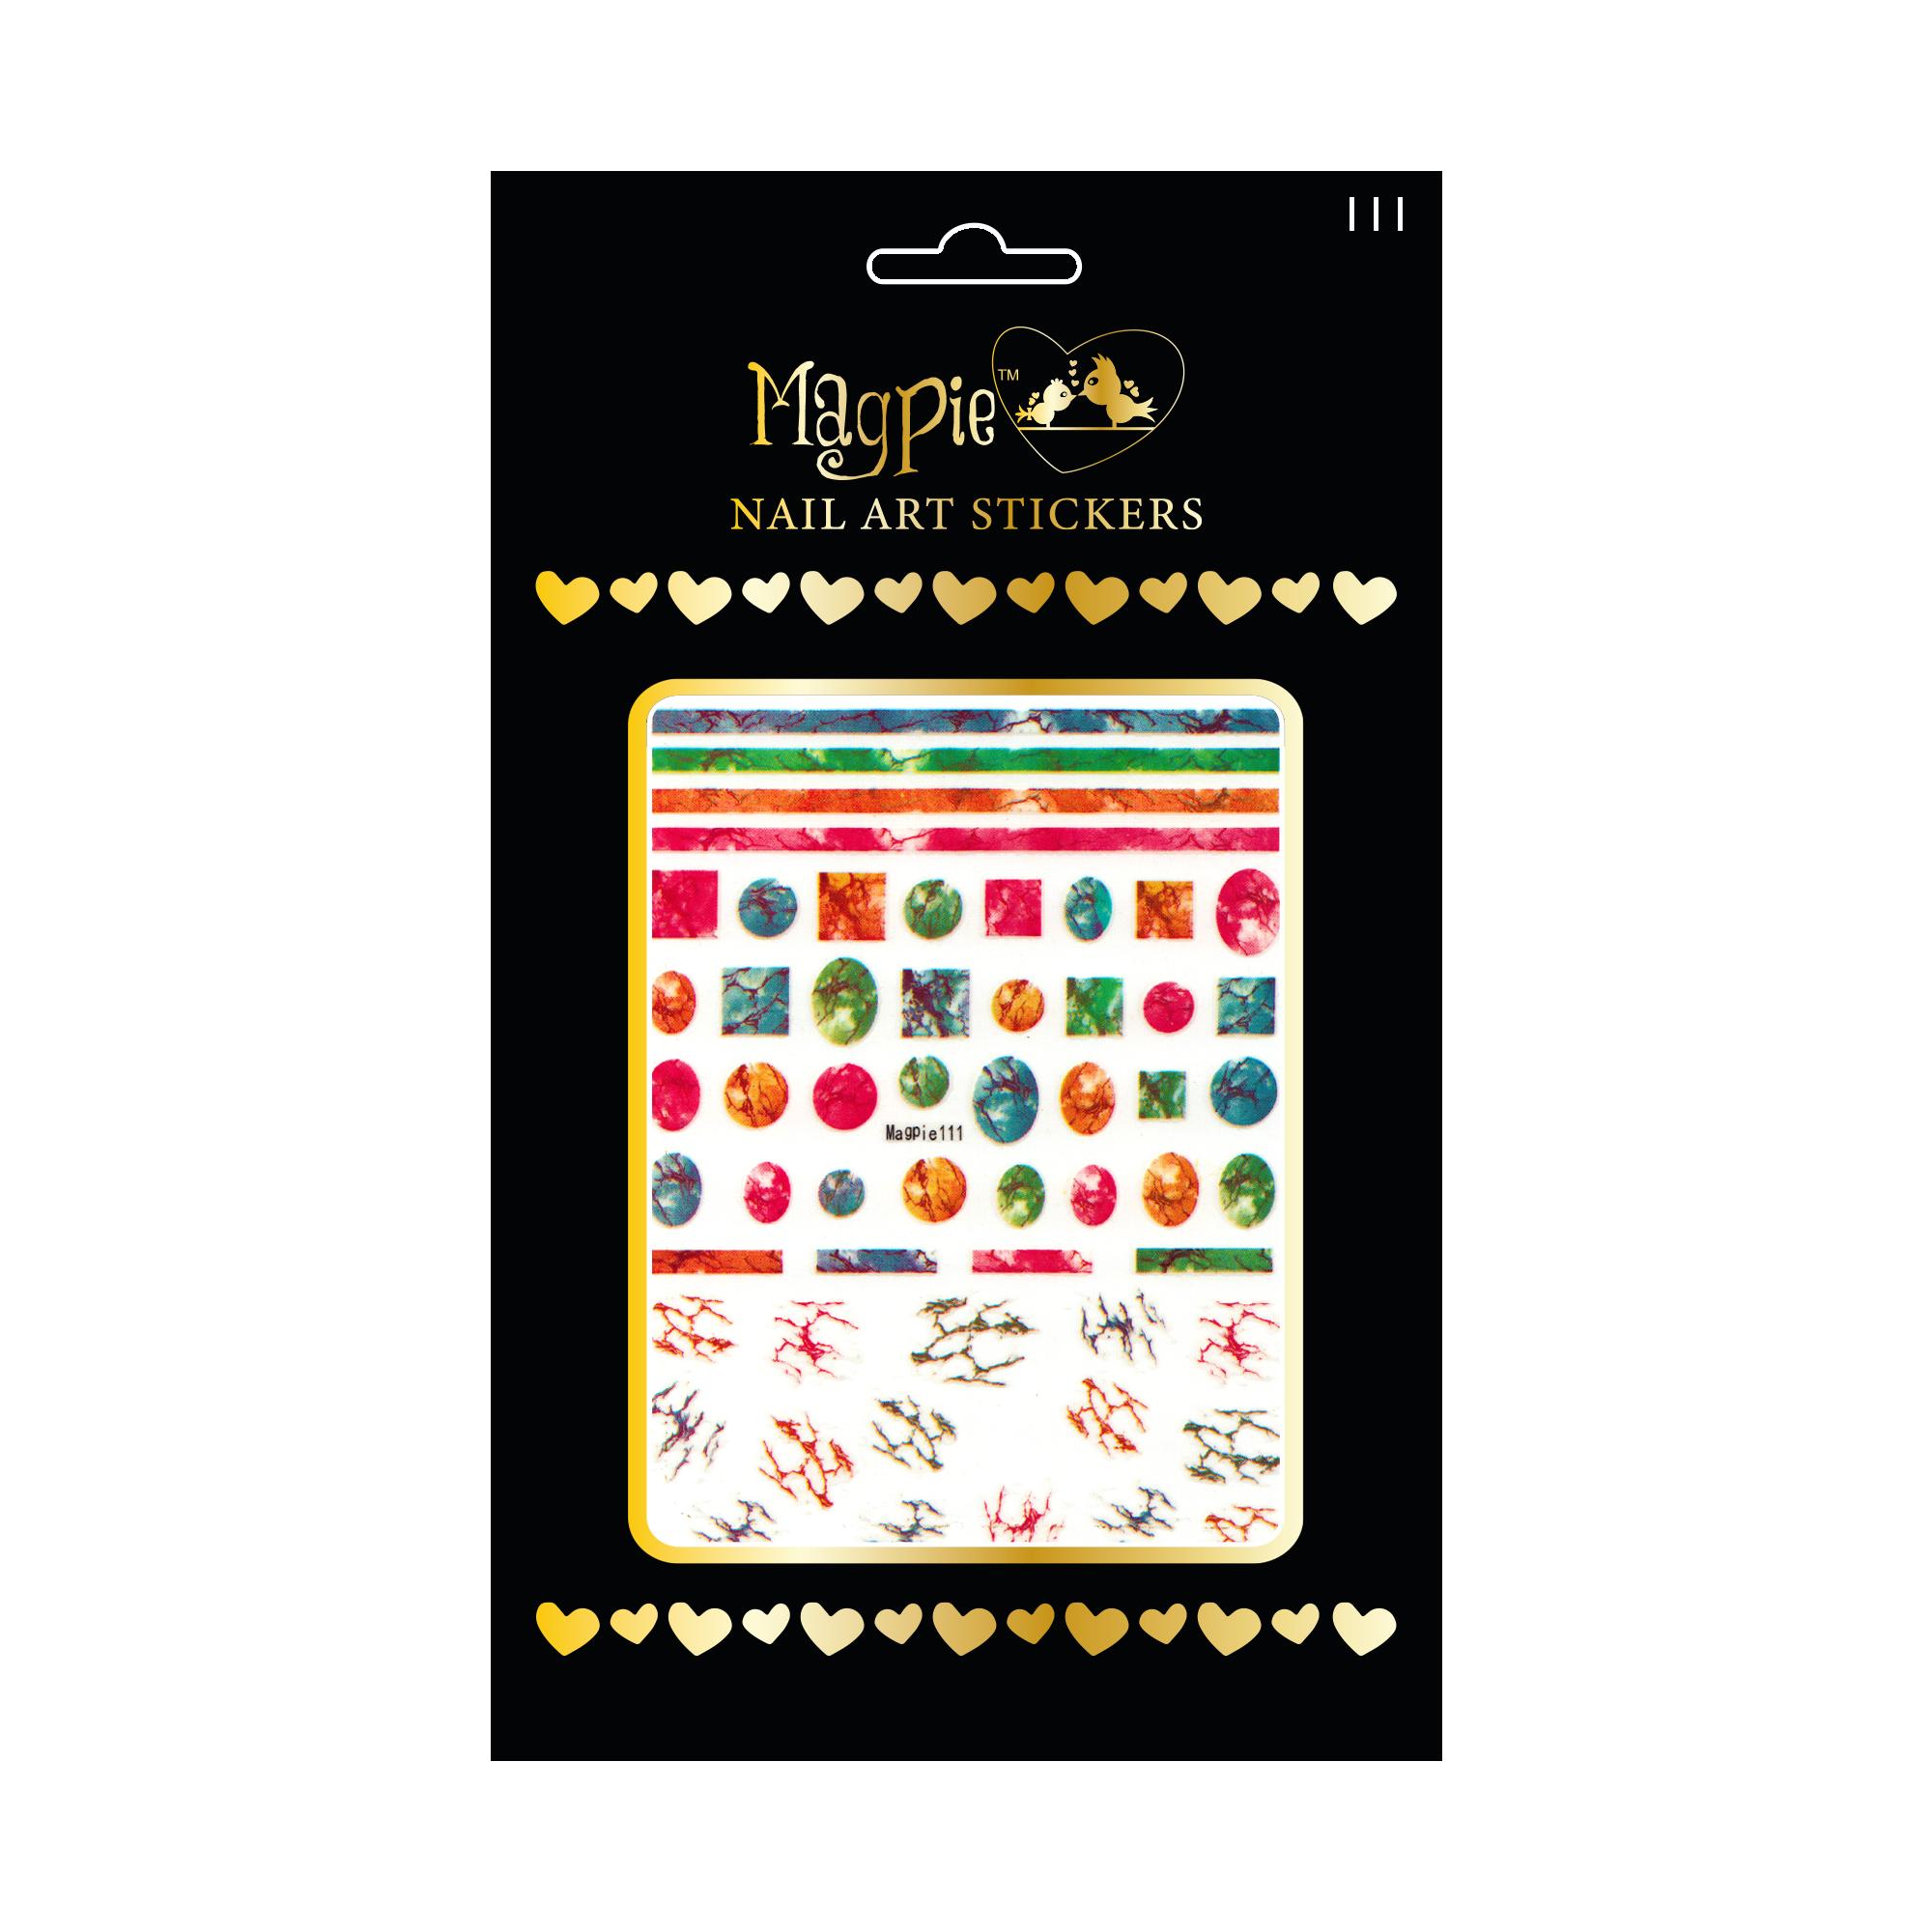 Magpie 111 stickers